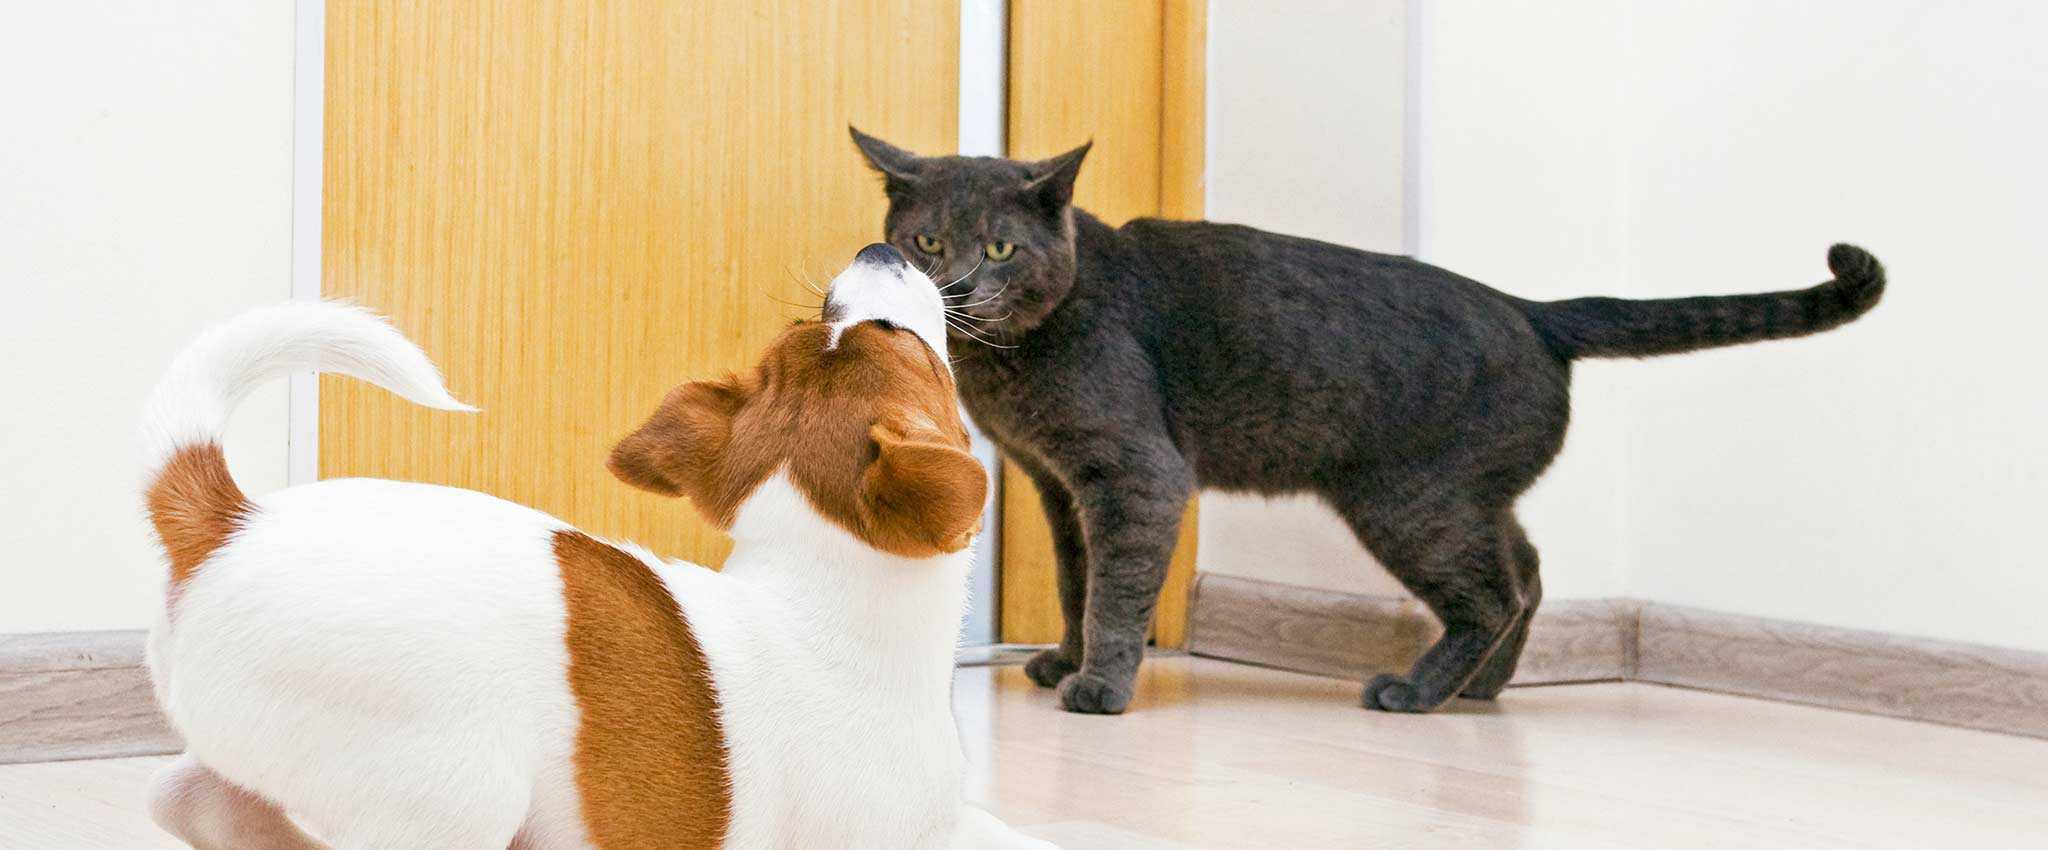 A cat facing down a dog